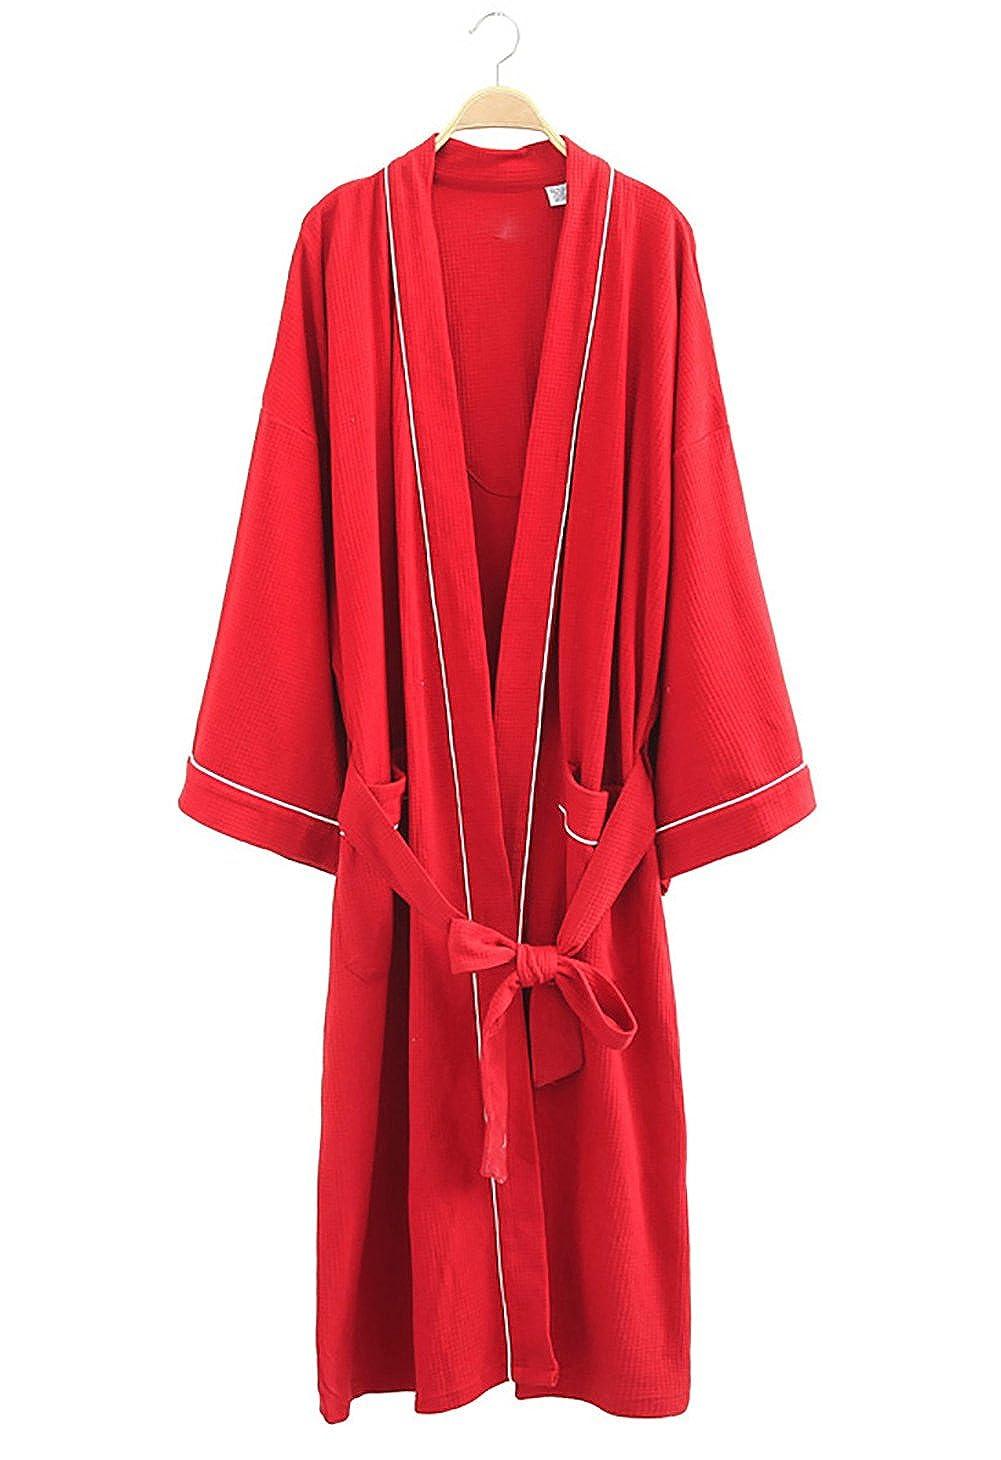 Cahayi Soft Women Men Bathrobe Lightweight Cotton Unisex Hotel Spa Robe Kimono CABR007